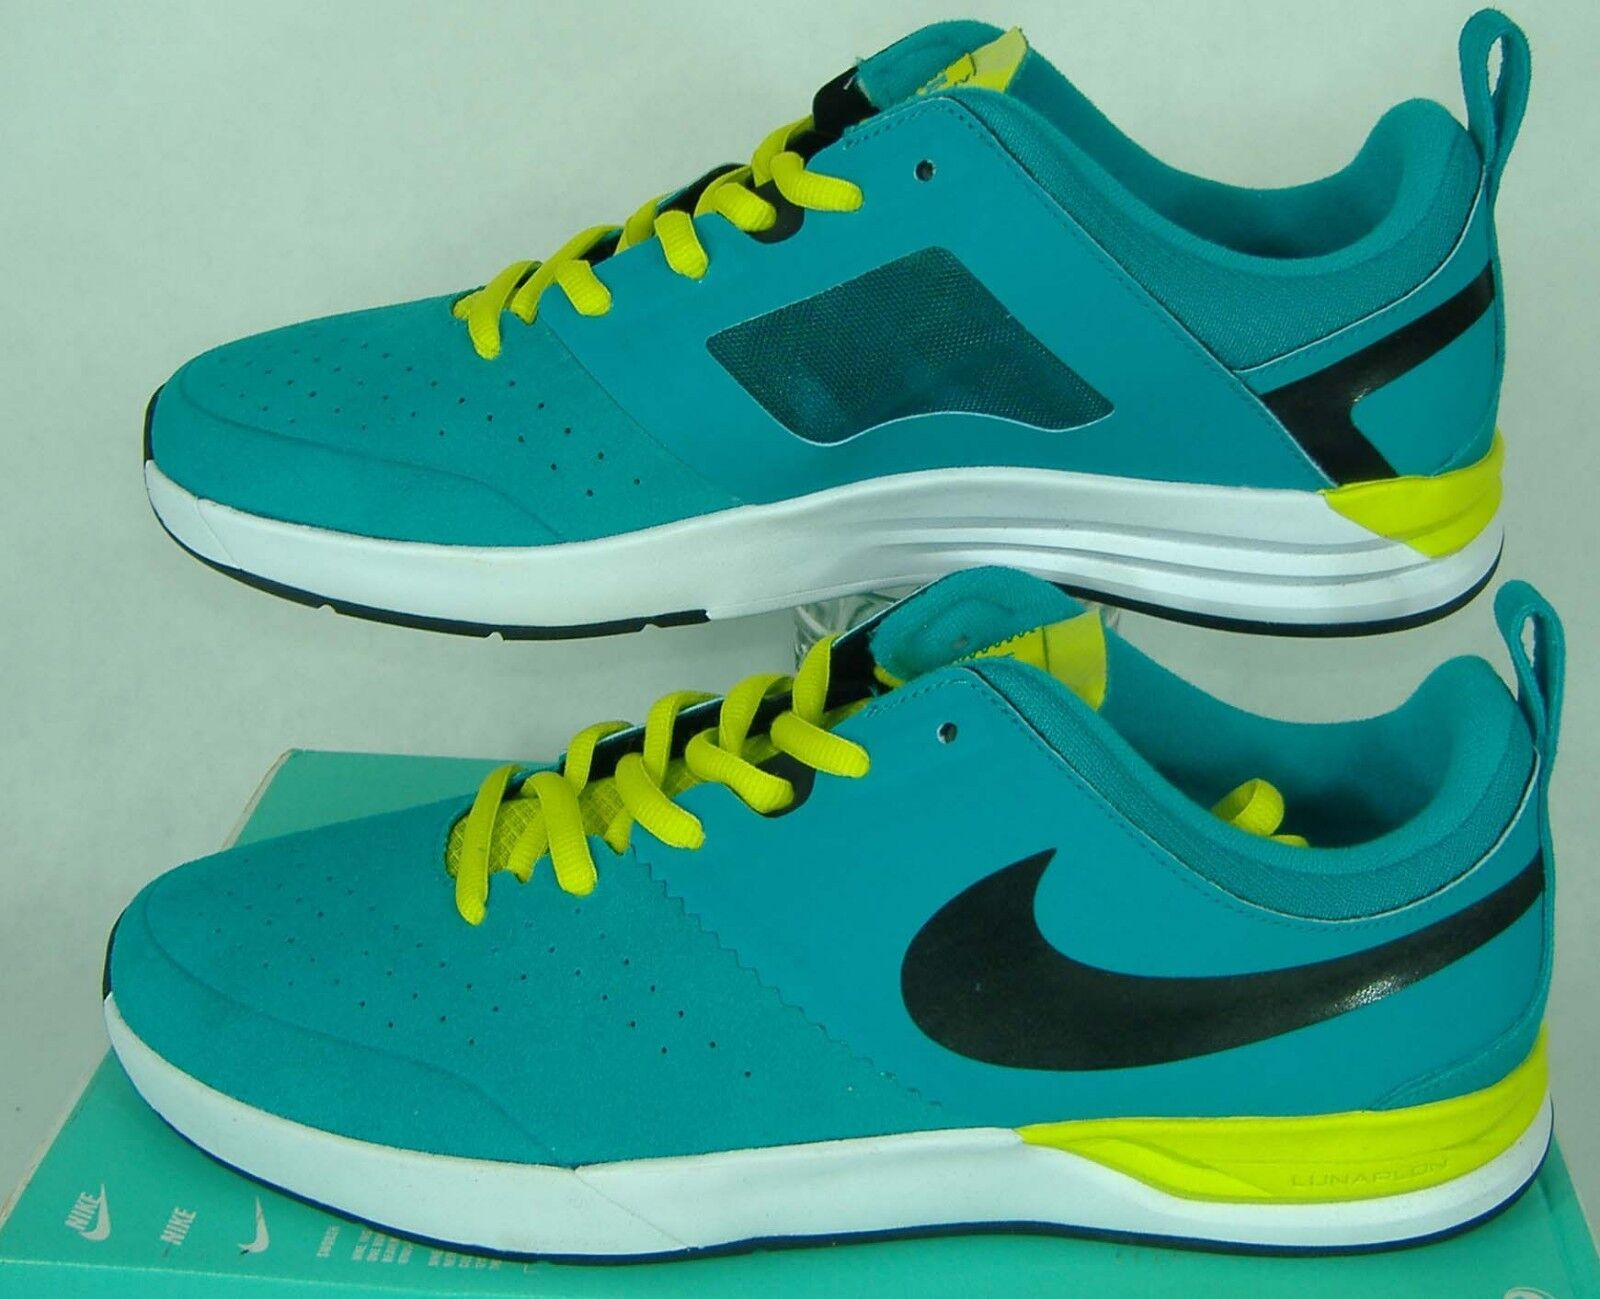 New Uomo 13 NIKE SB Project BA Turbo Green White Skateboard Shoes  95 599698-316